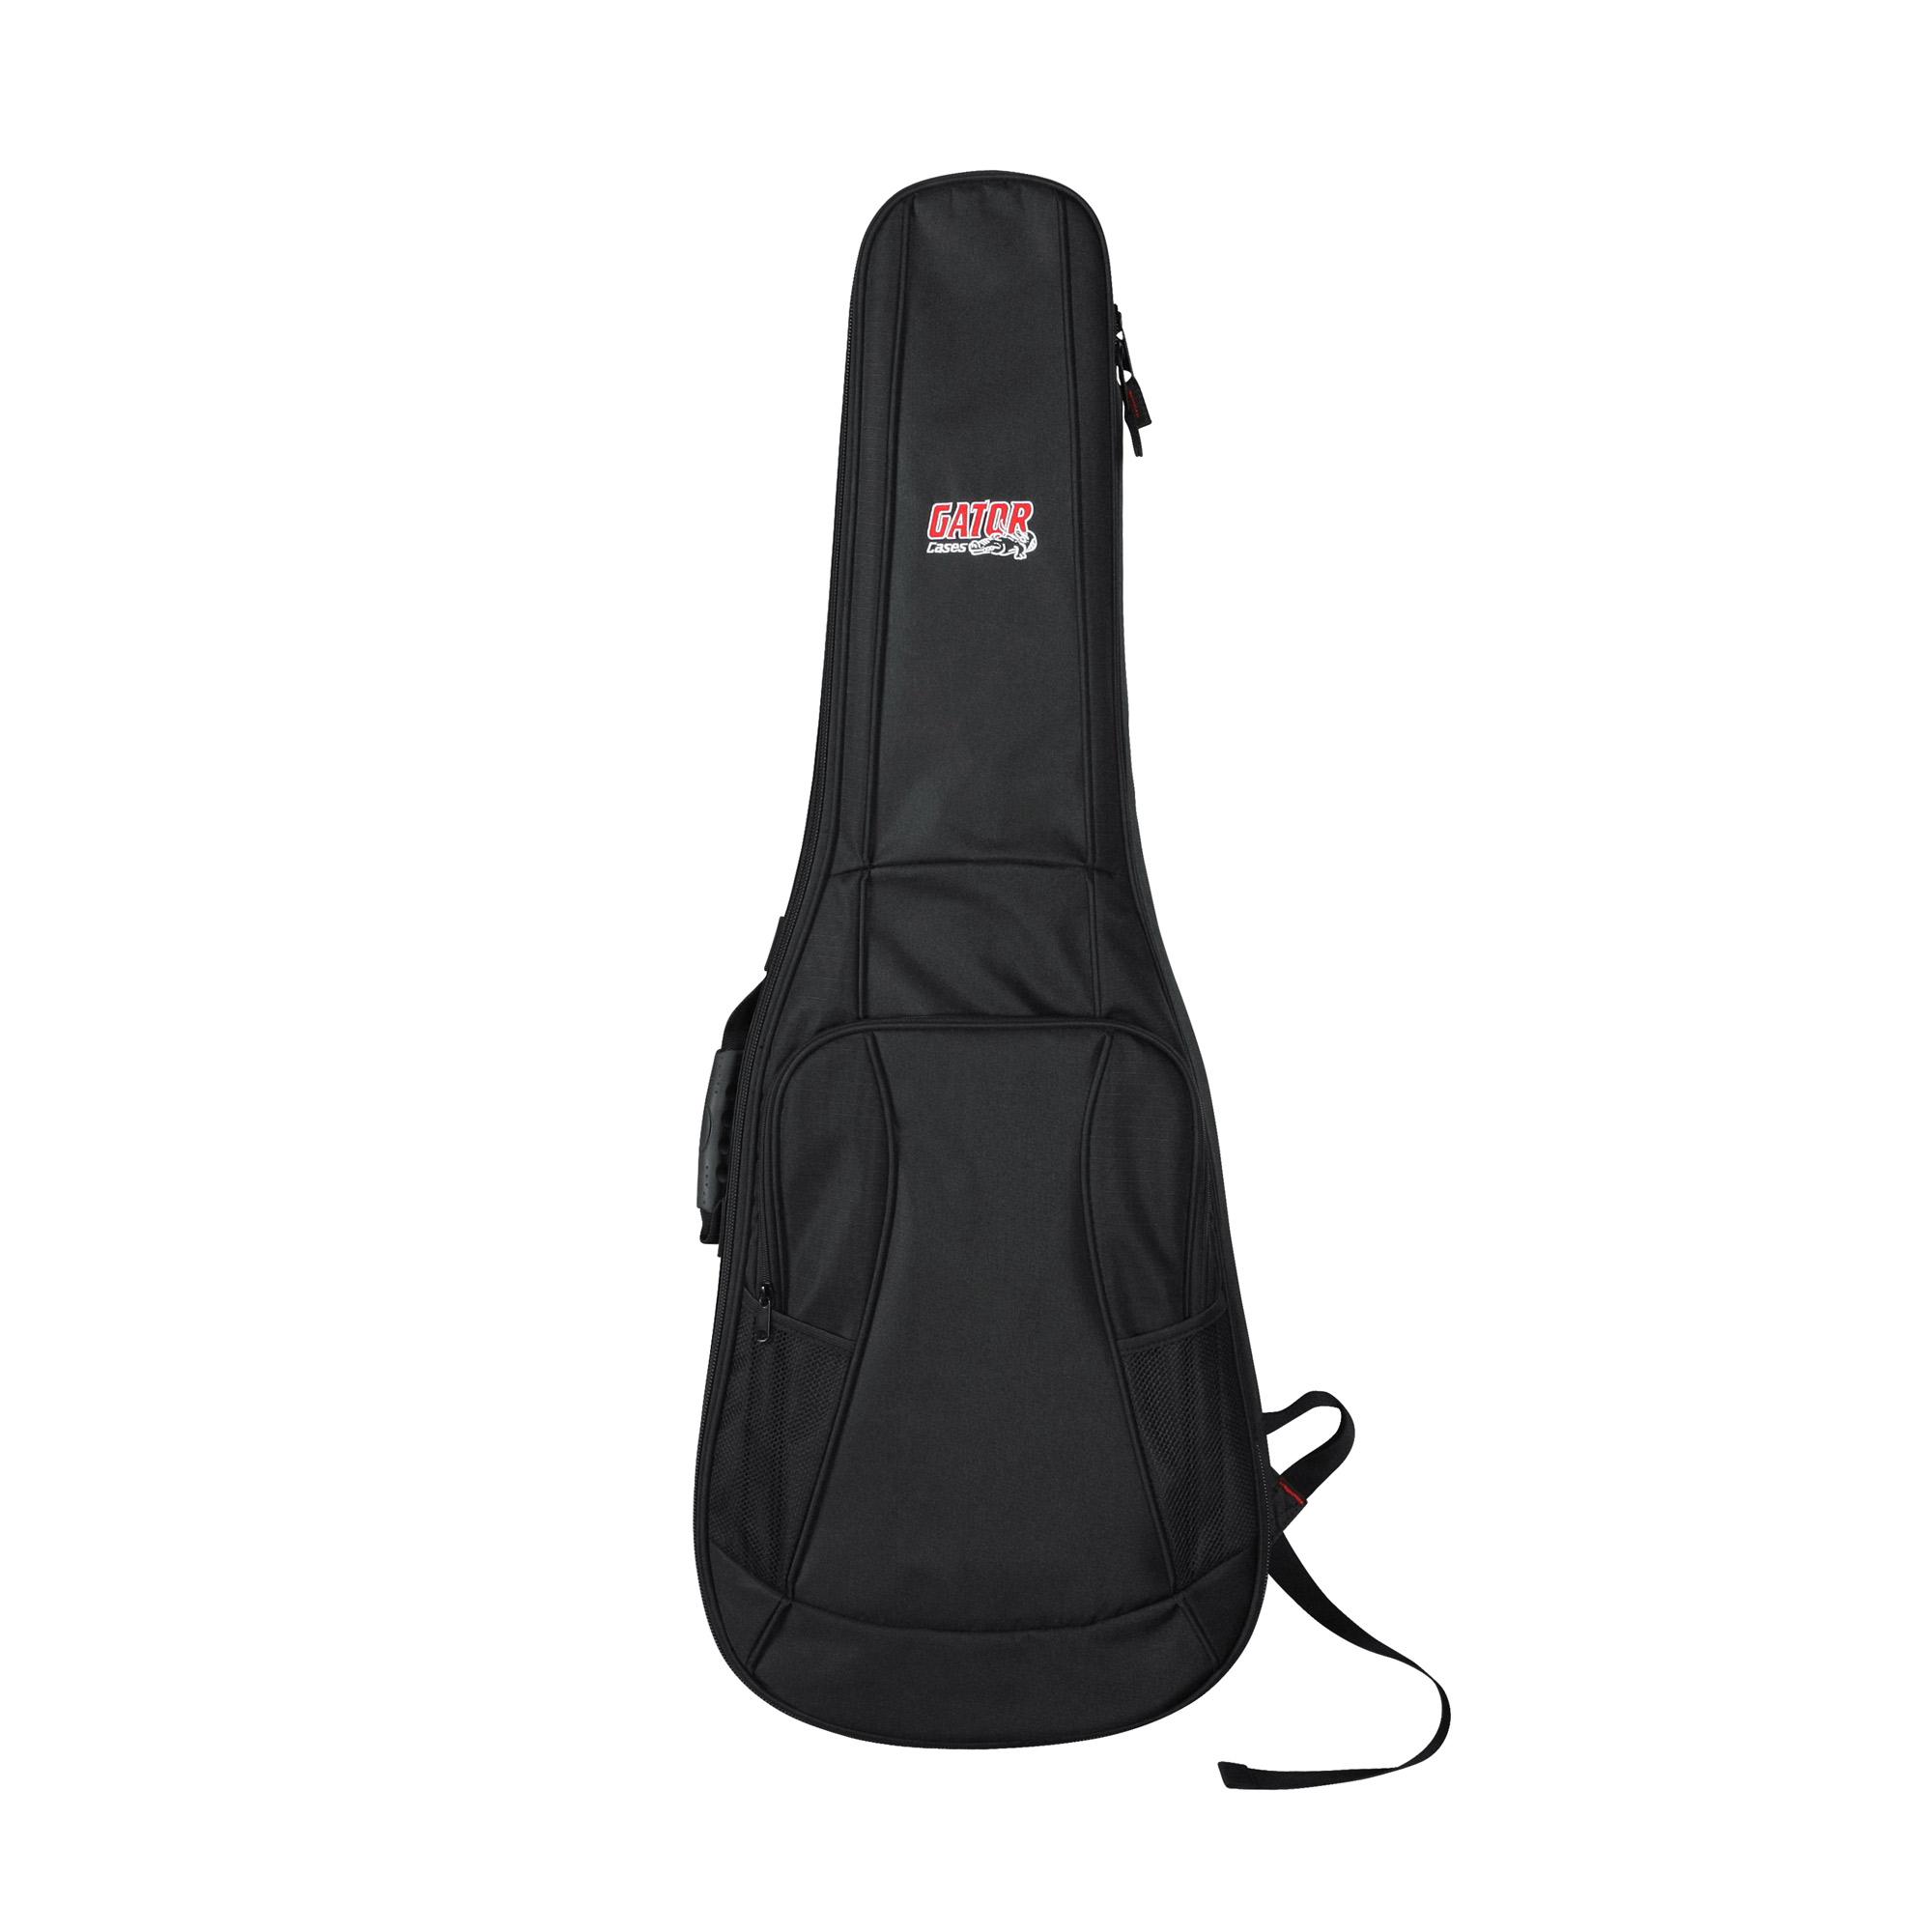 Gator Cases Gb 4g Electric Series Guitar Gig Bag With String Diagram Ebay Straps Black